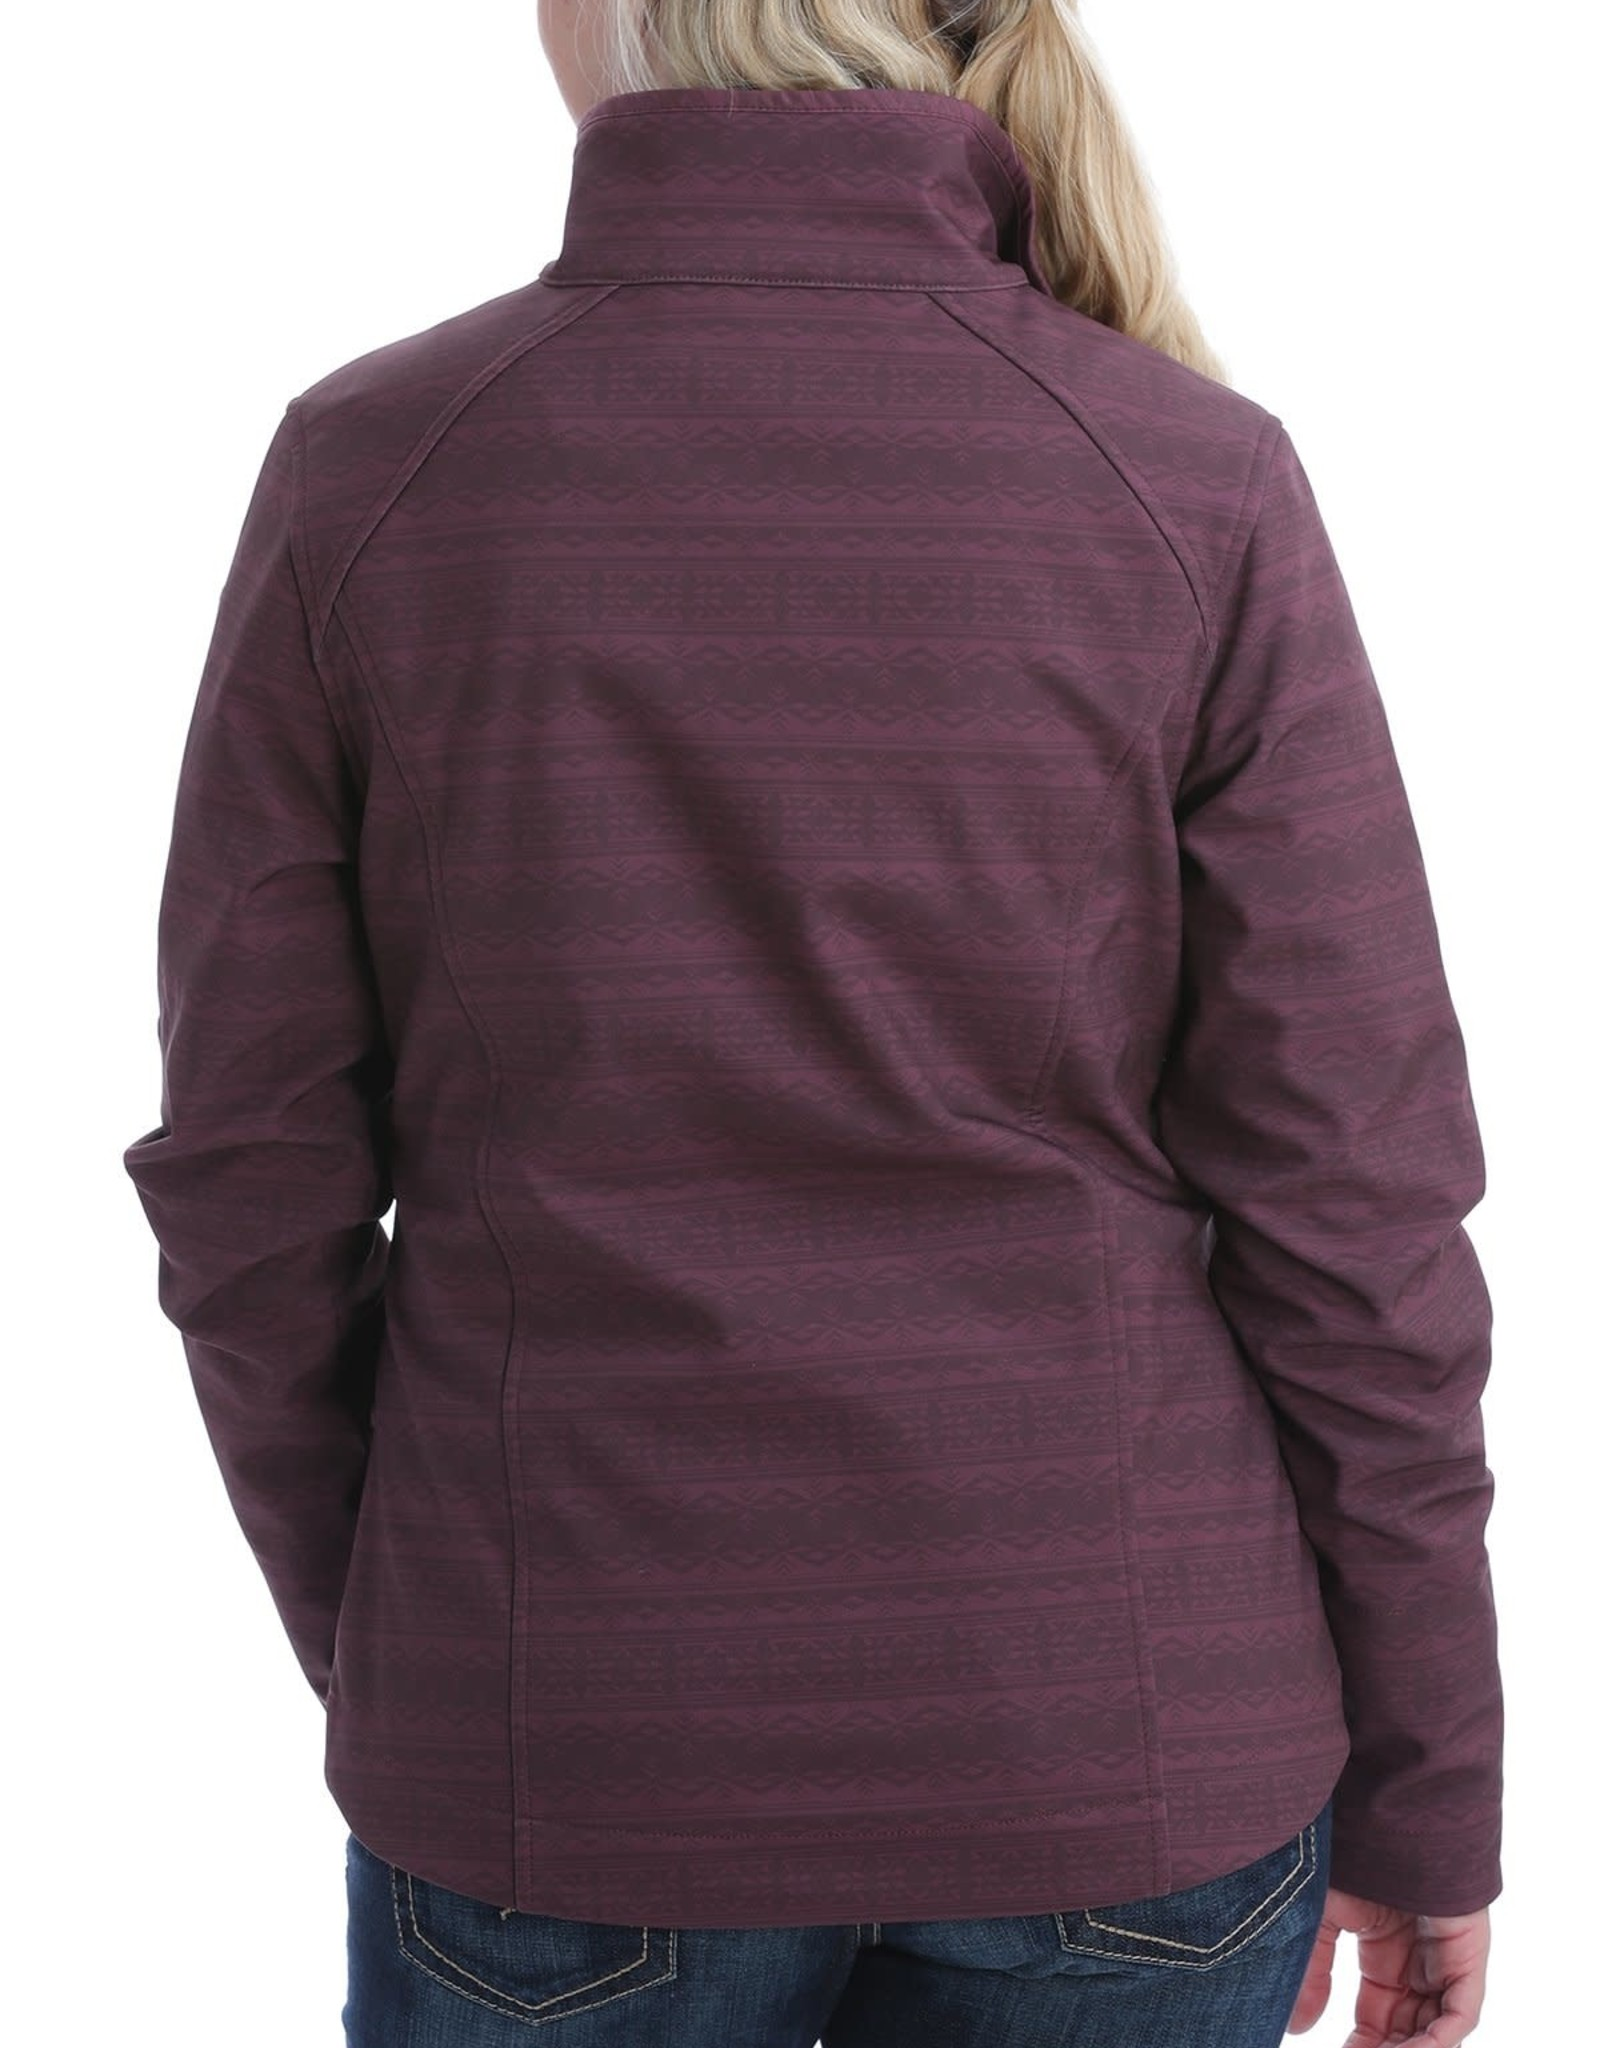 Cinch Womens Cinch Burgundy Print Bonded Jacket